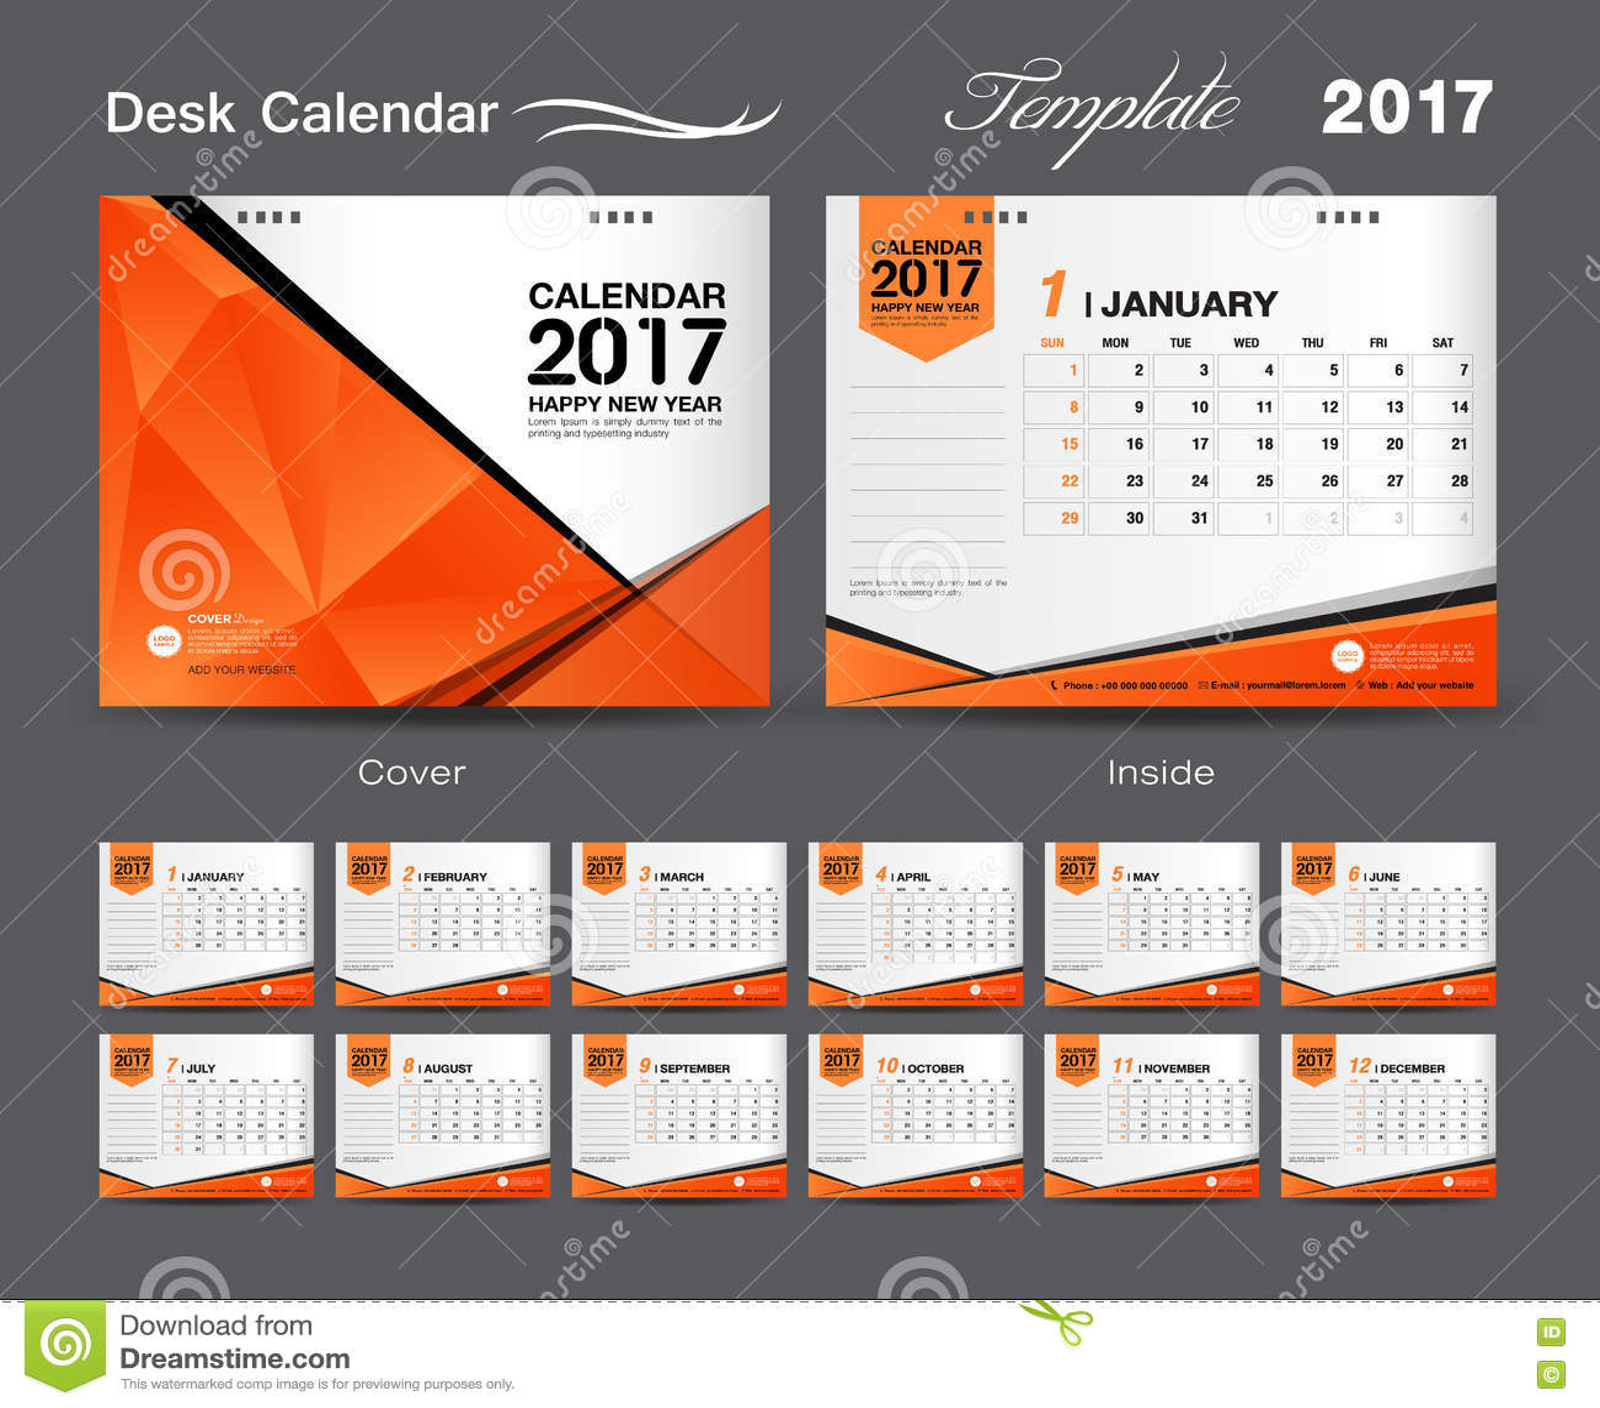 Calendar Design Price : Set orange desk calendar template design cover